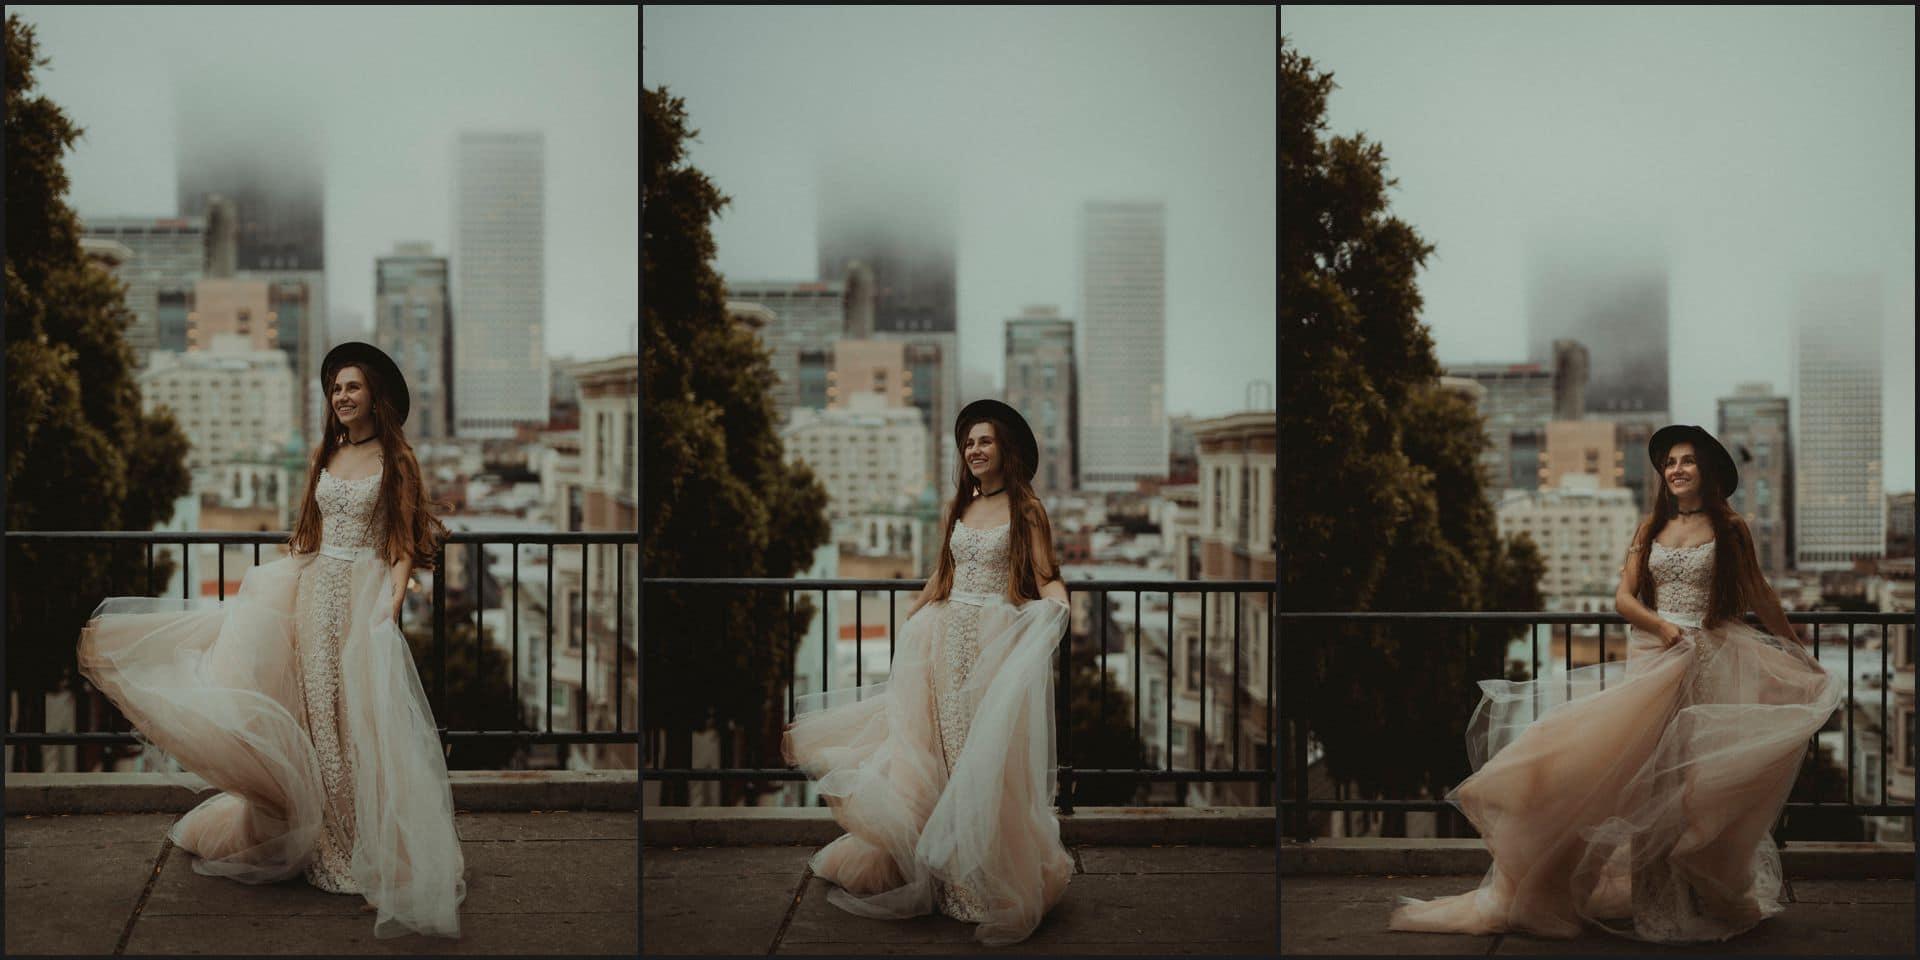 san francisco, california, elopement wedding, bride, hat, dress, lombard street